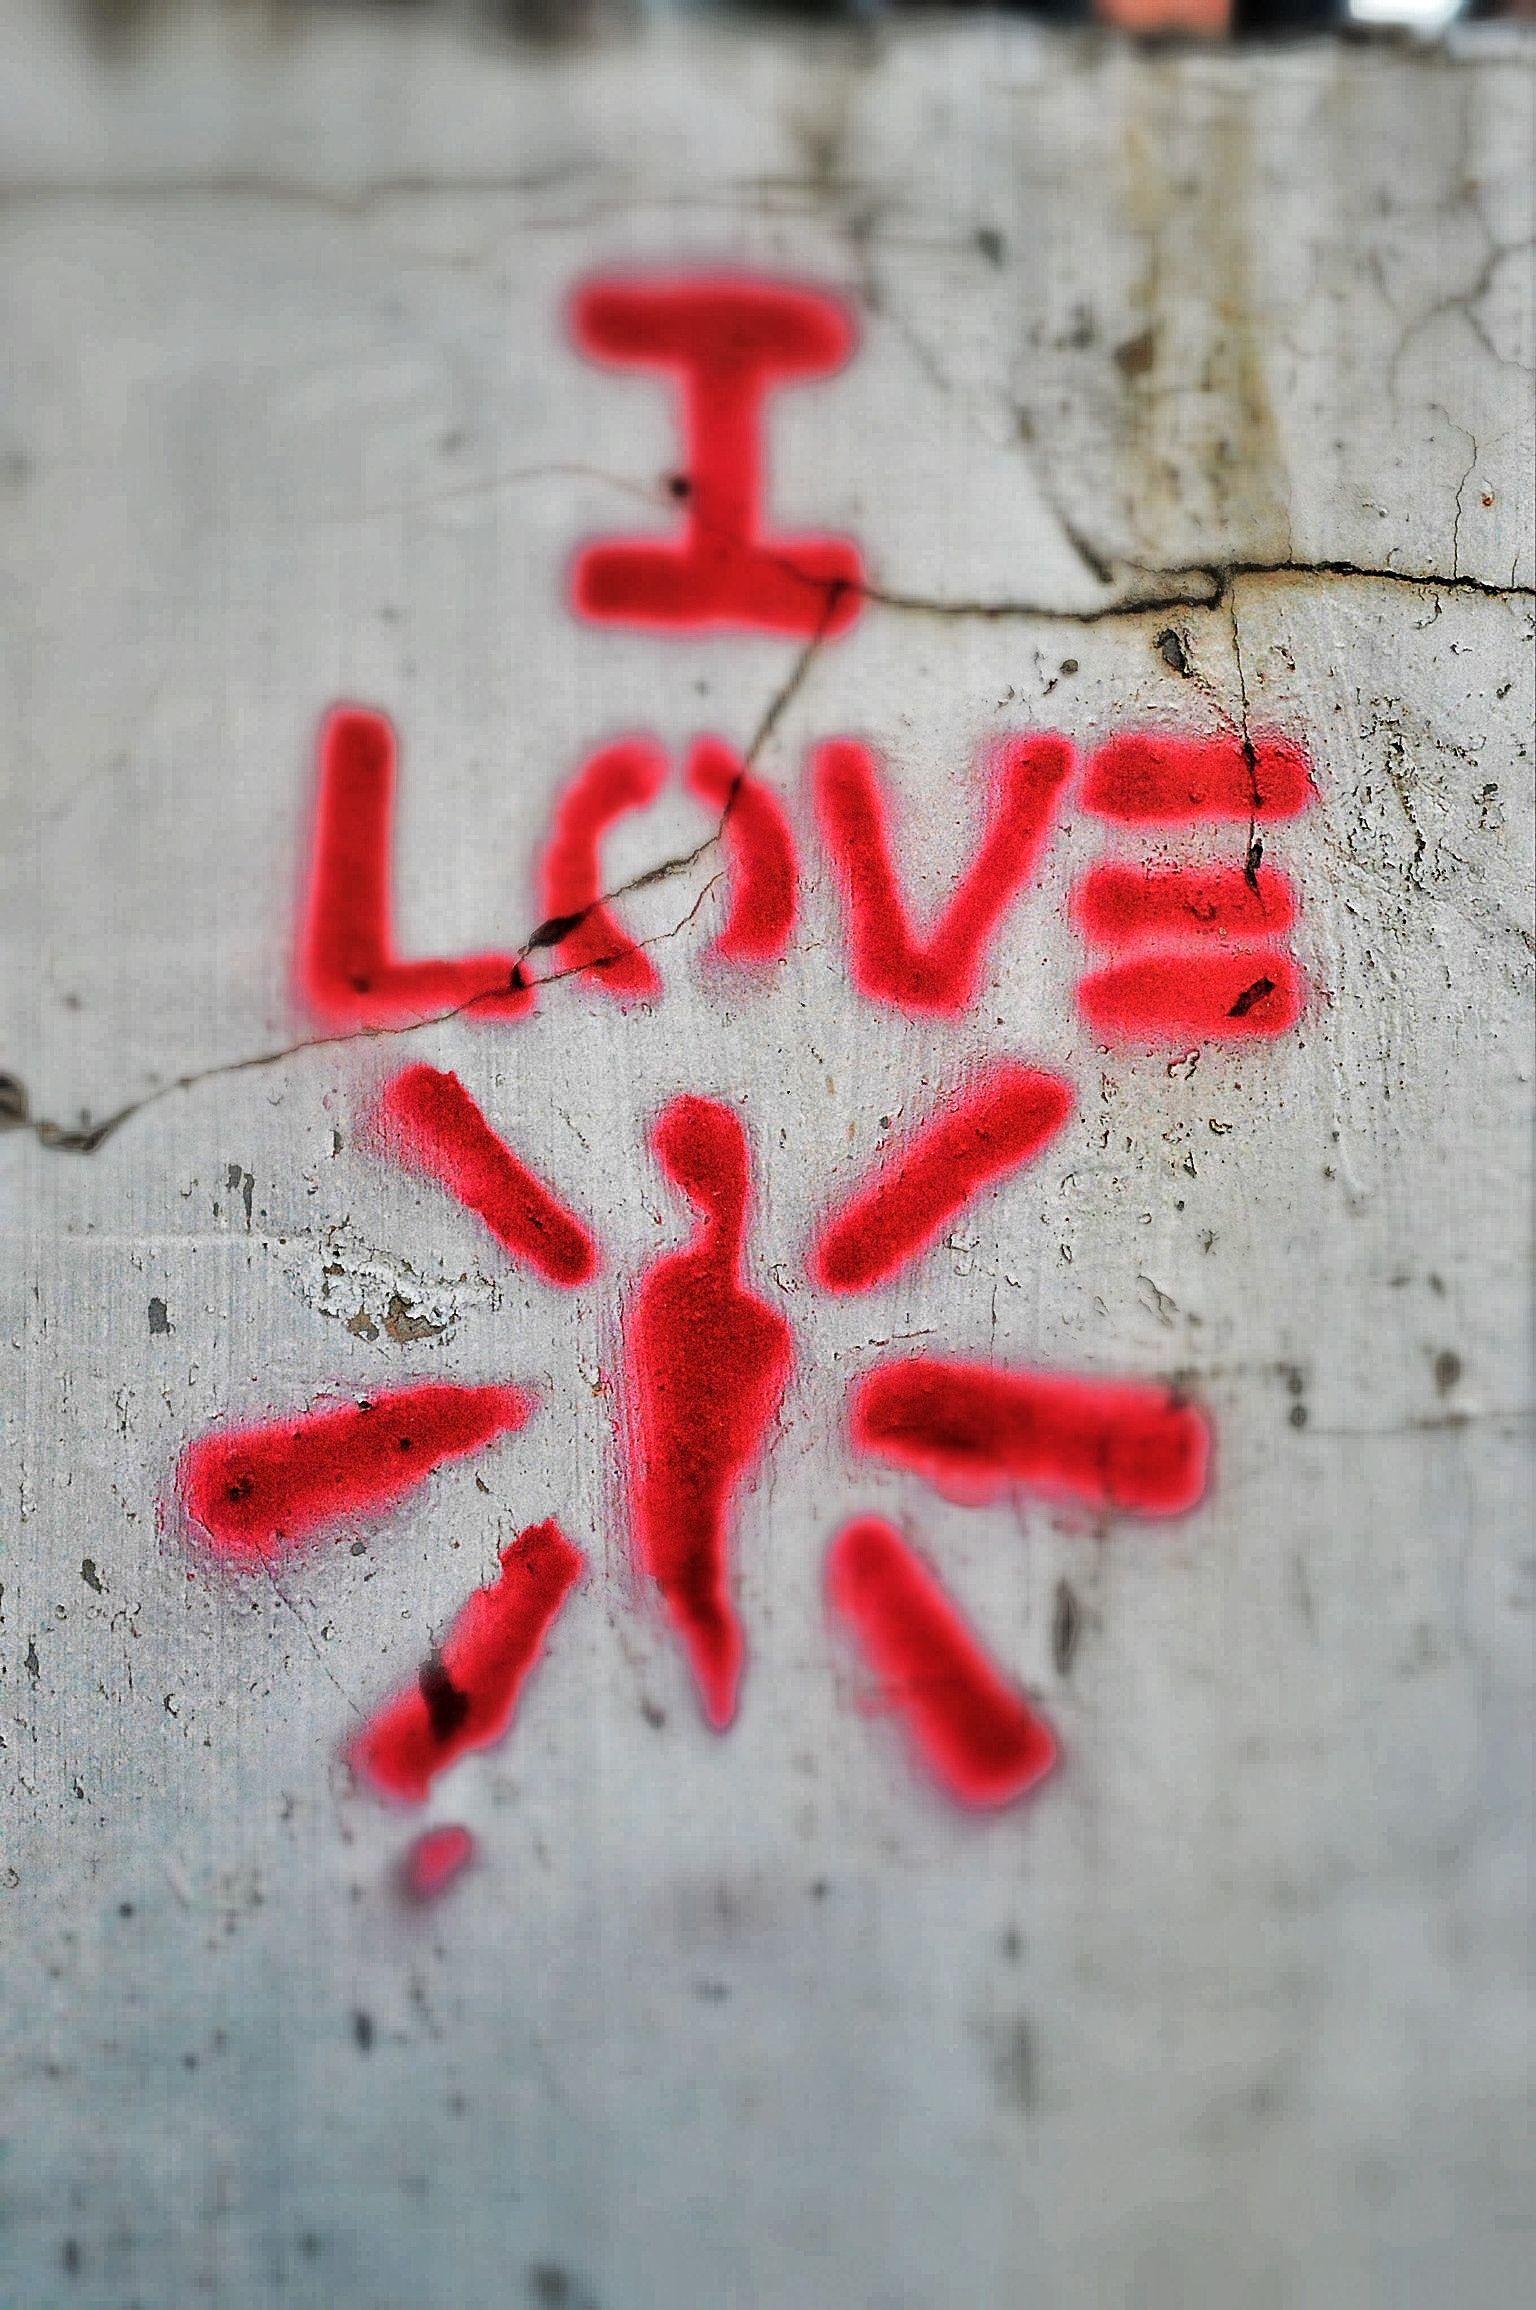 Love Photo Michele Tumminello